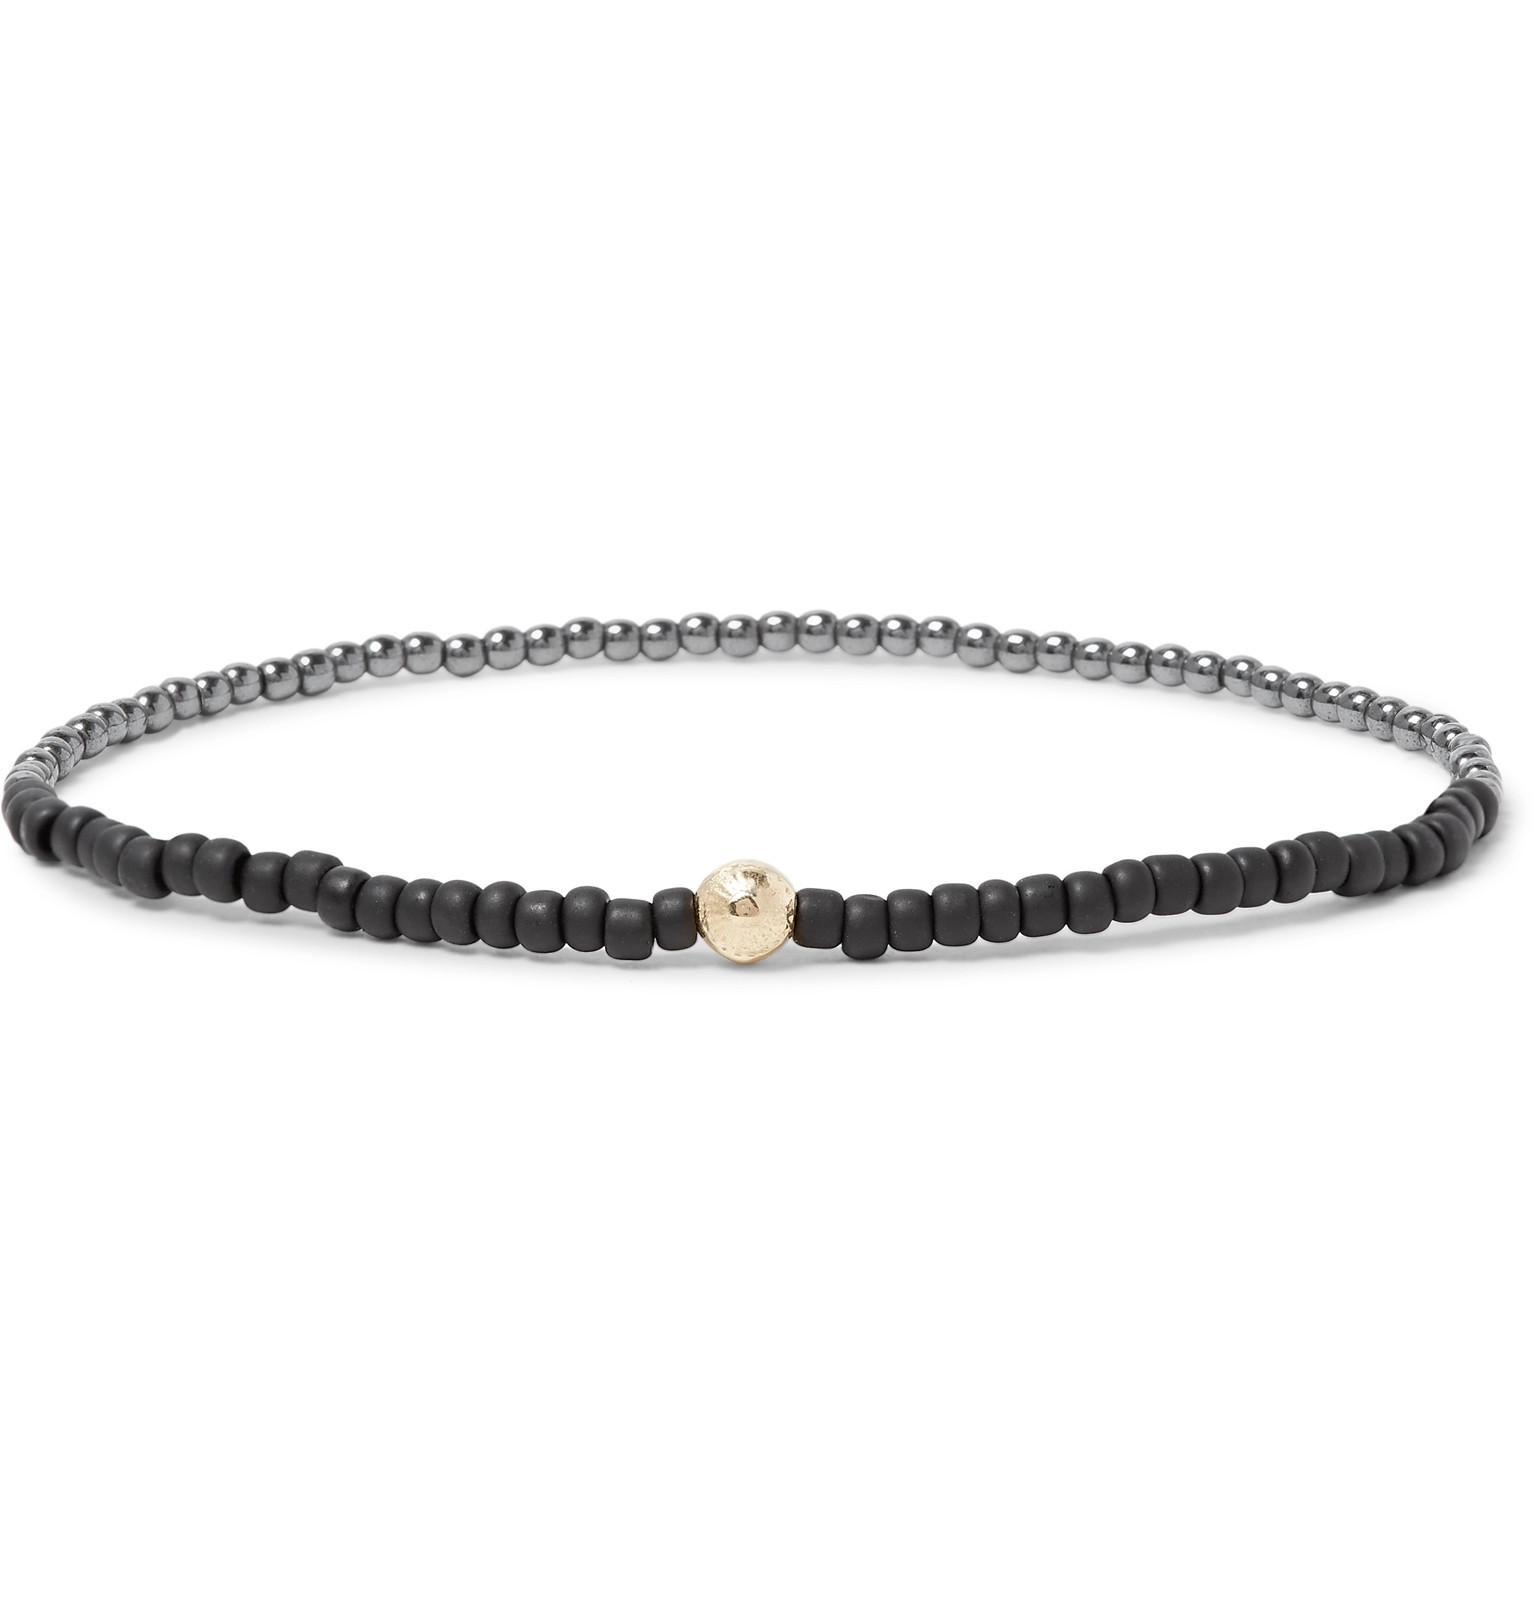 Luis Morais Beaded Wood, 14-karat Gold And Diamond Bracelet - Black